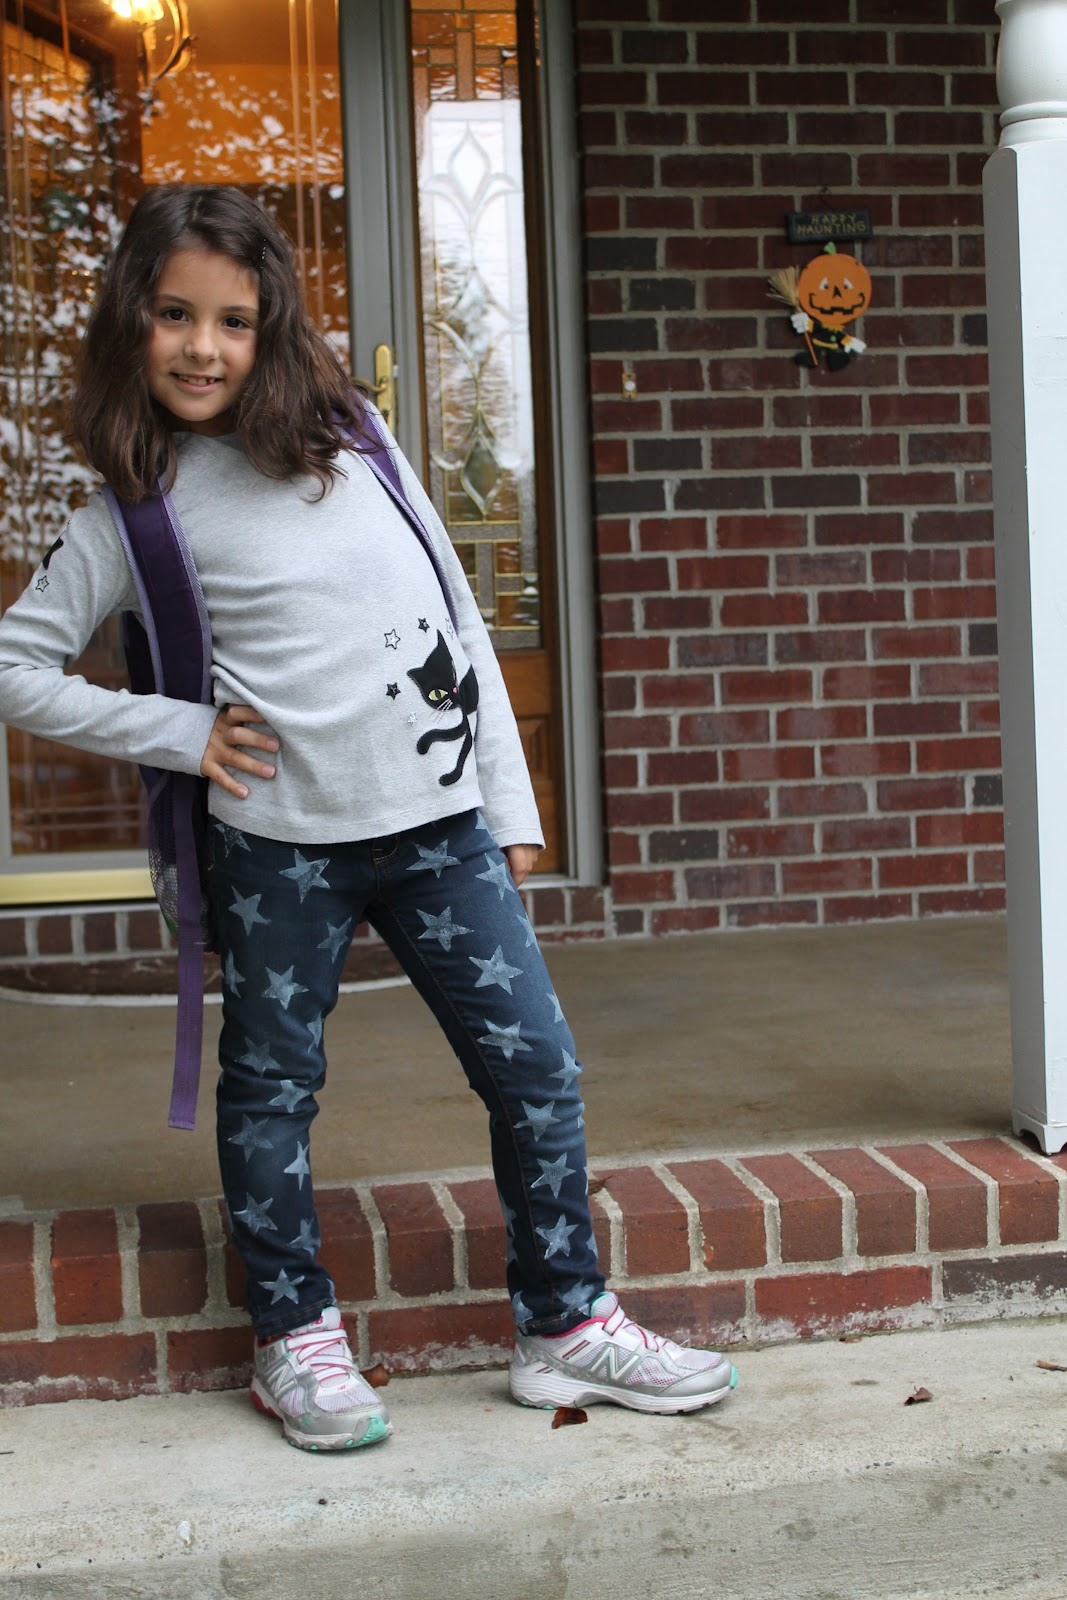 Diy Star Print Denim Jeans Soccer Mom Style